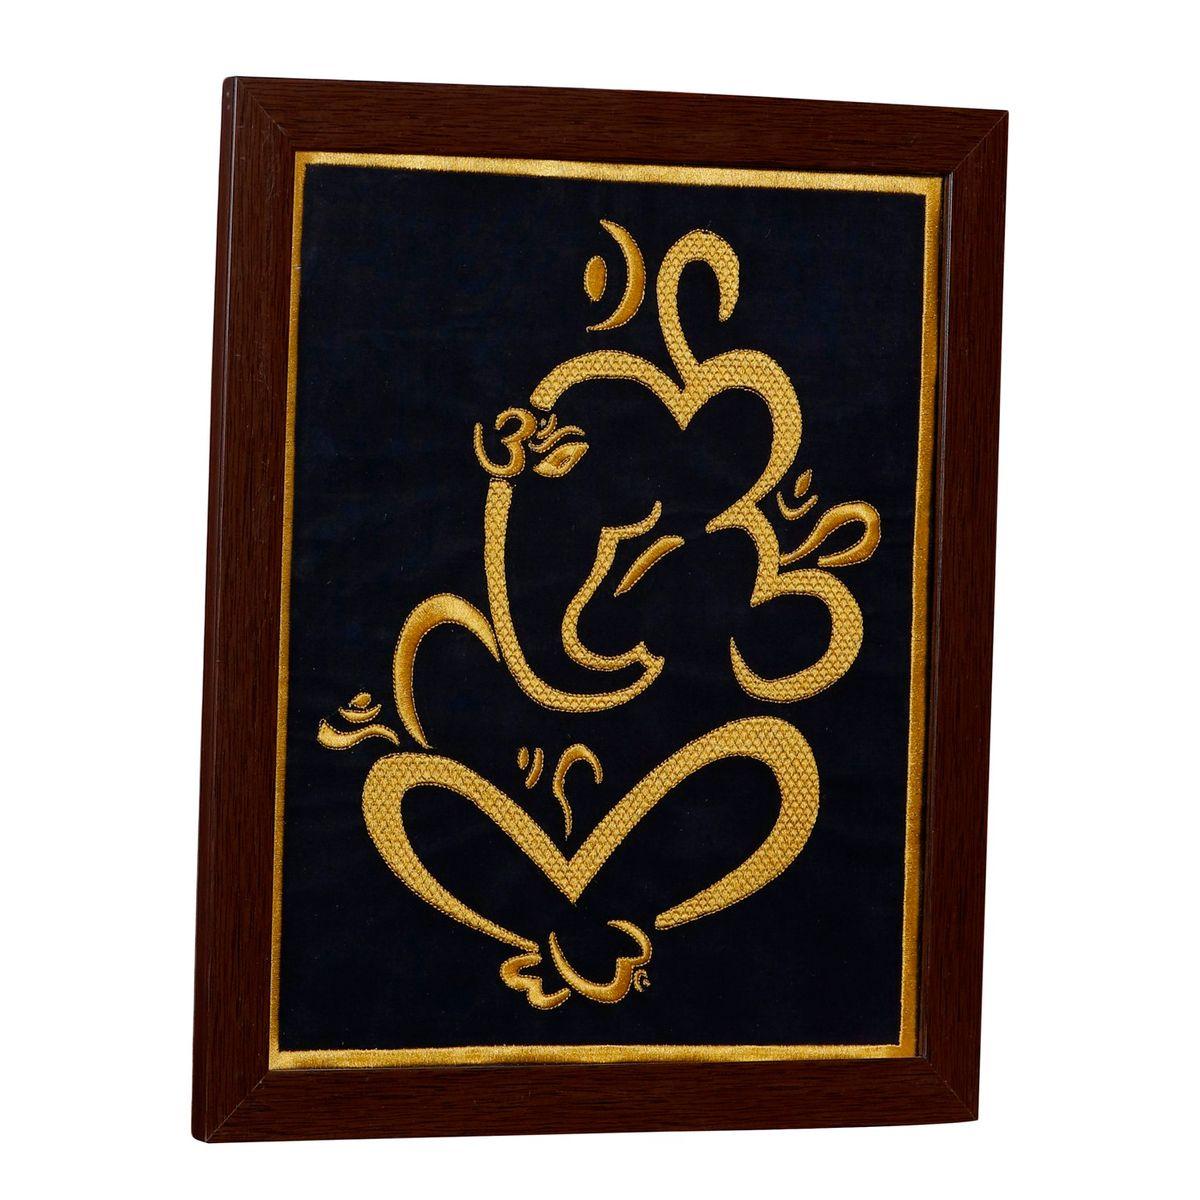 P K Ganesha Art Wall Hangings Frame Embroidered